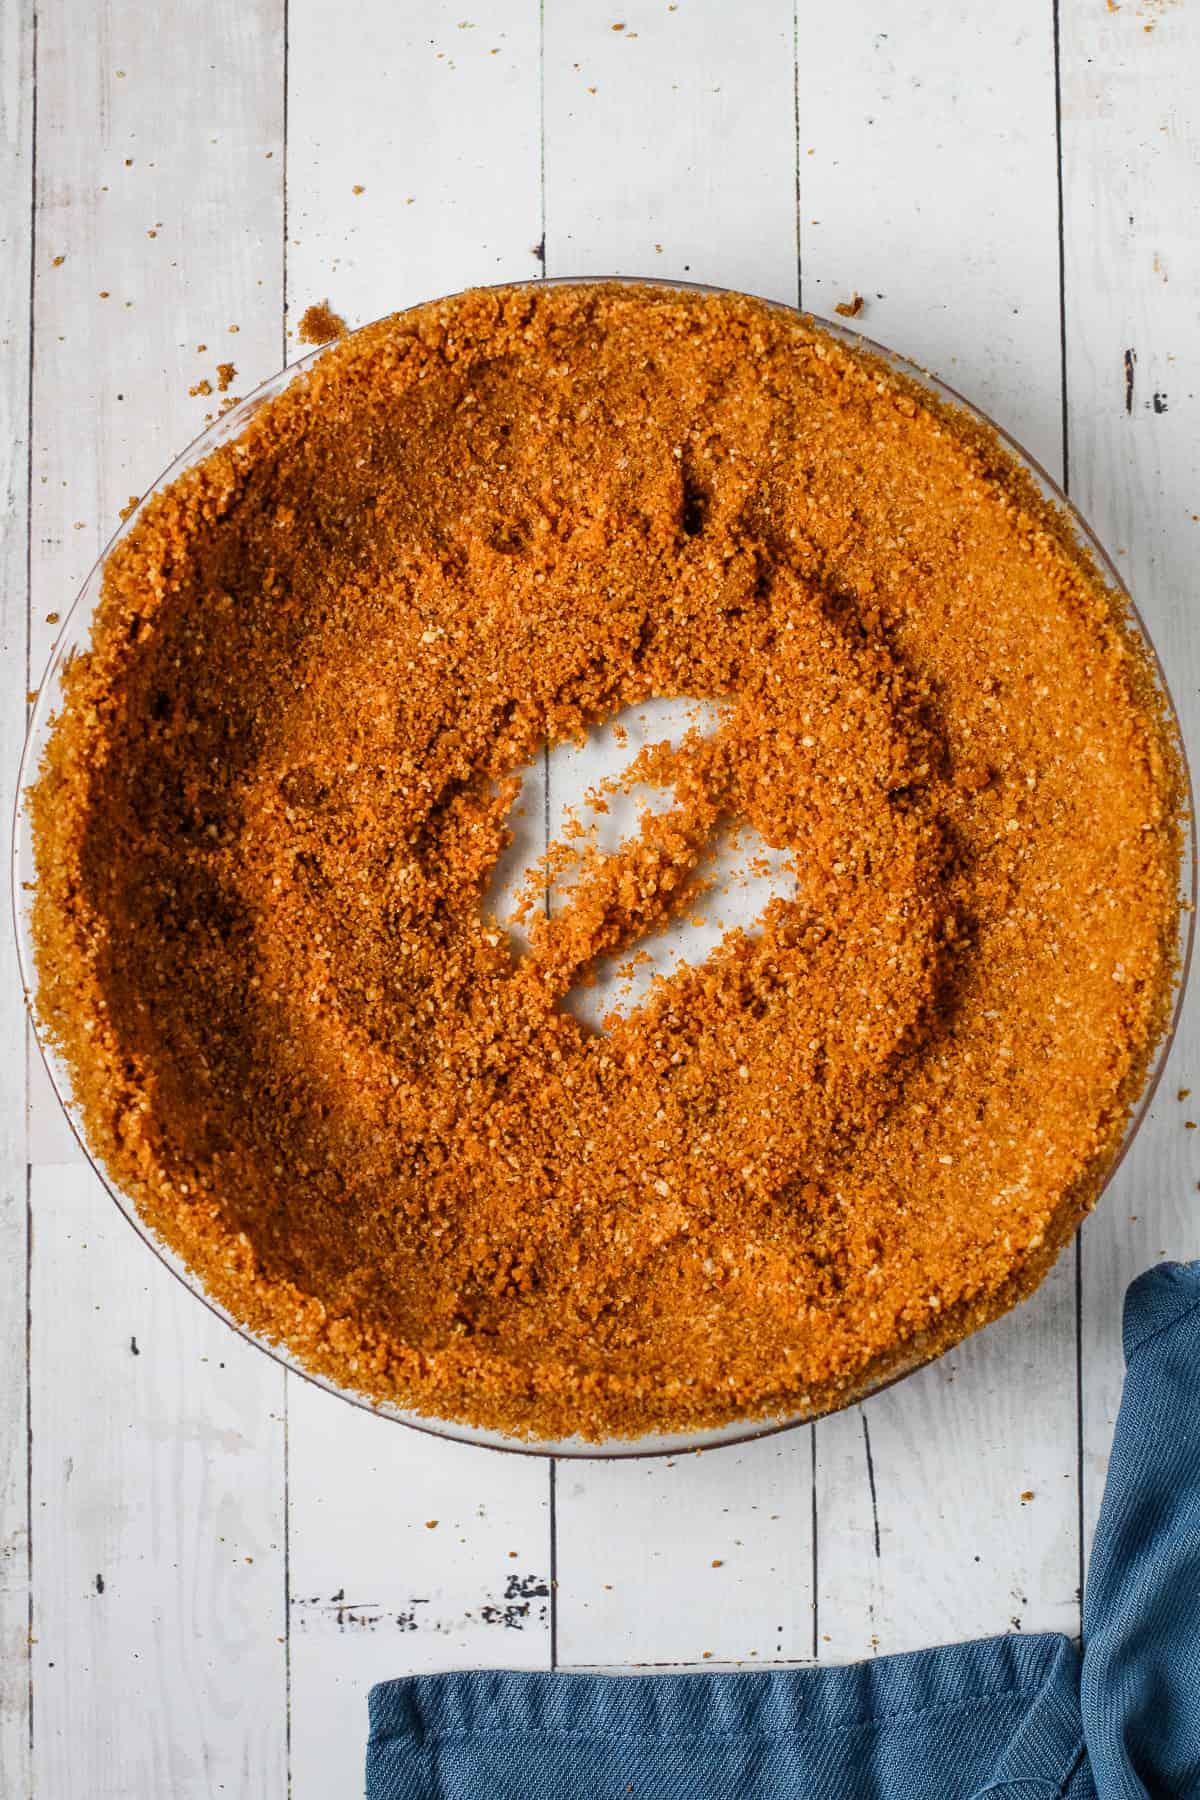 Easy gingersnap crust recipe